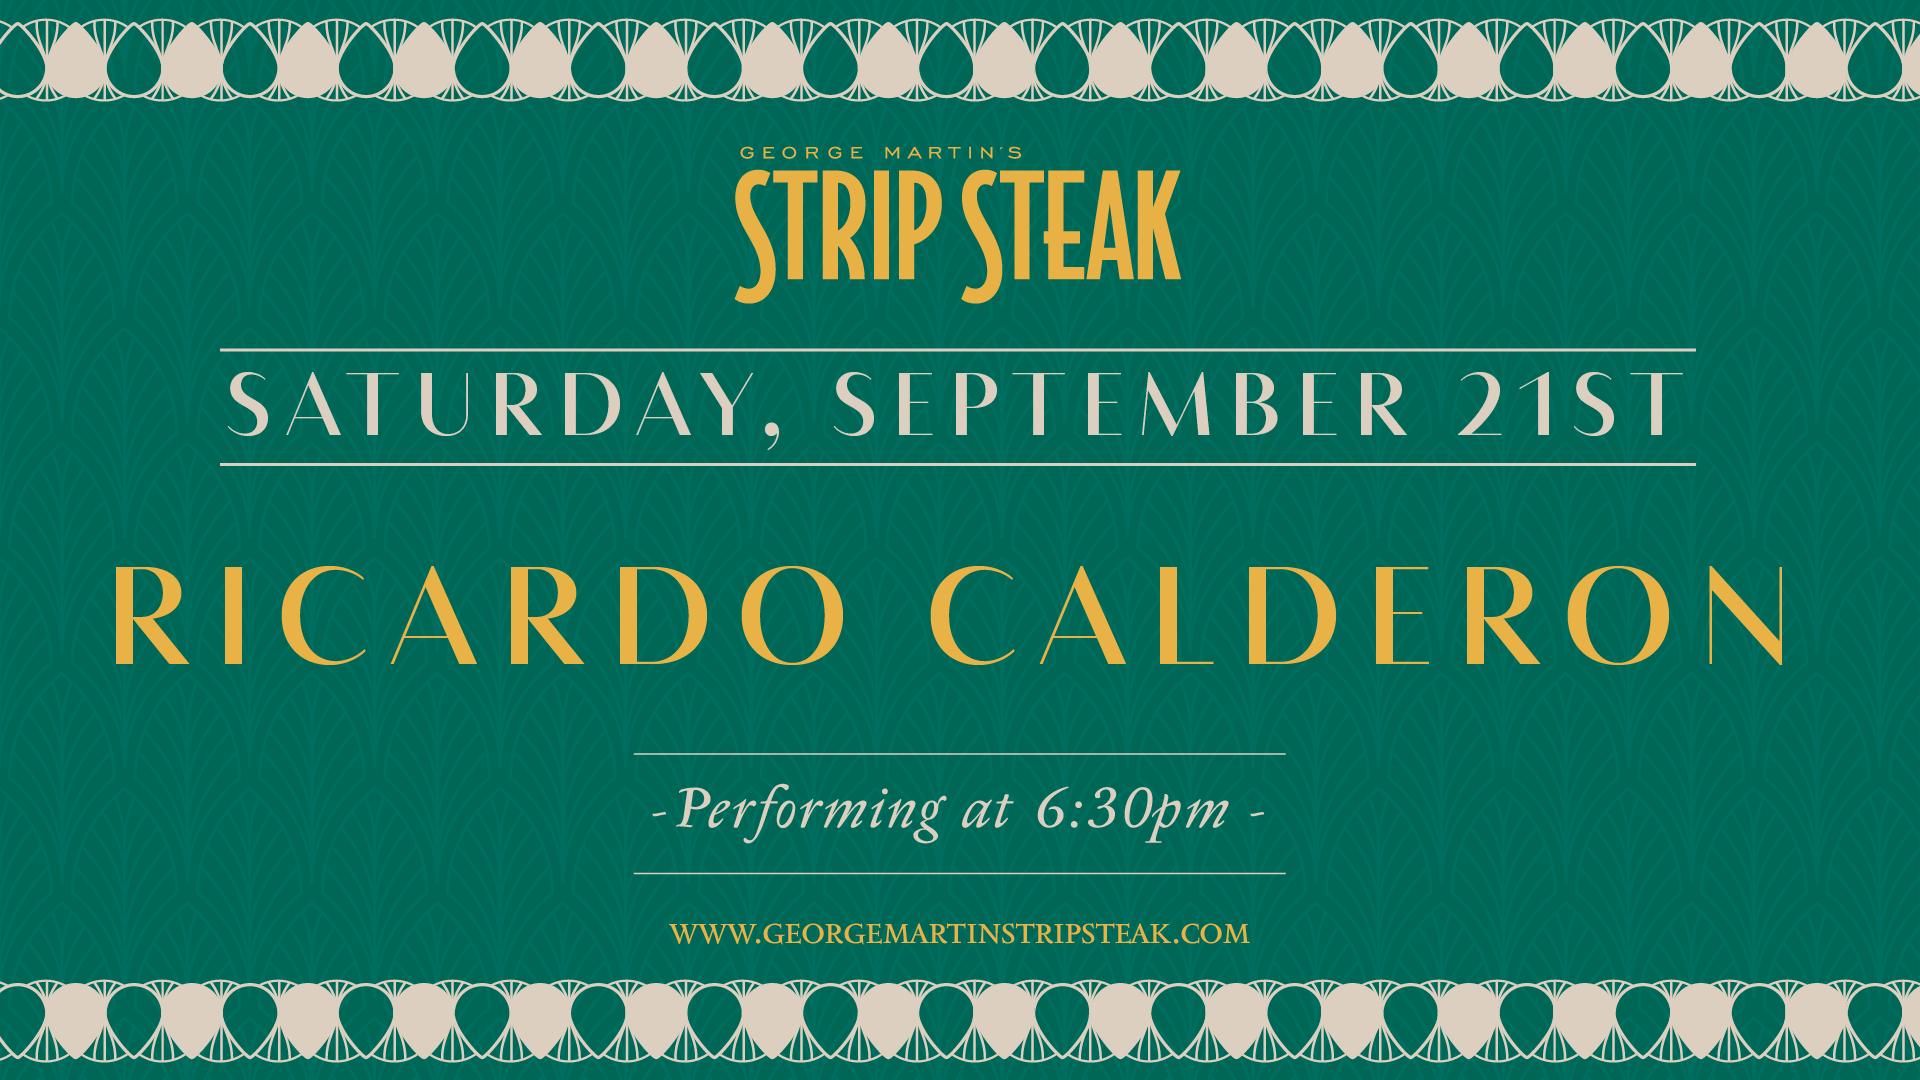 Flyer for Ricardo Calderon on Saturday, September 21st at 6:30pm